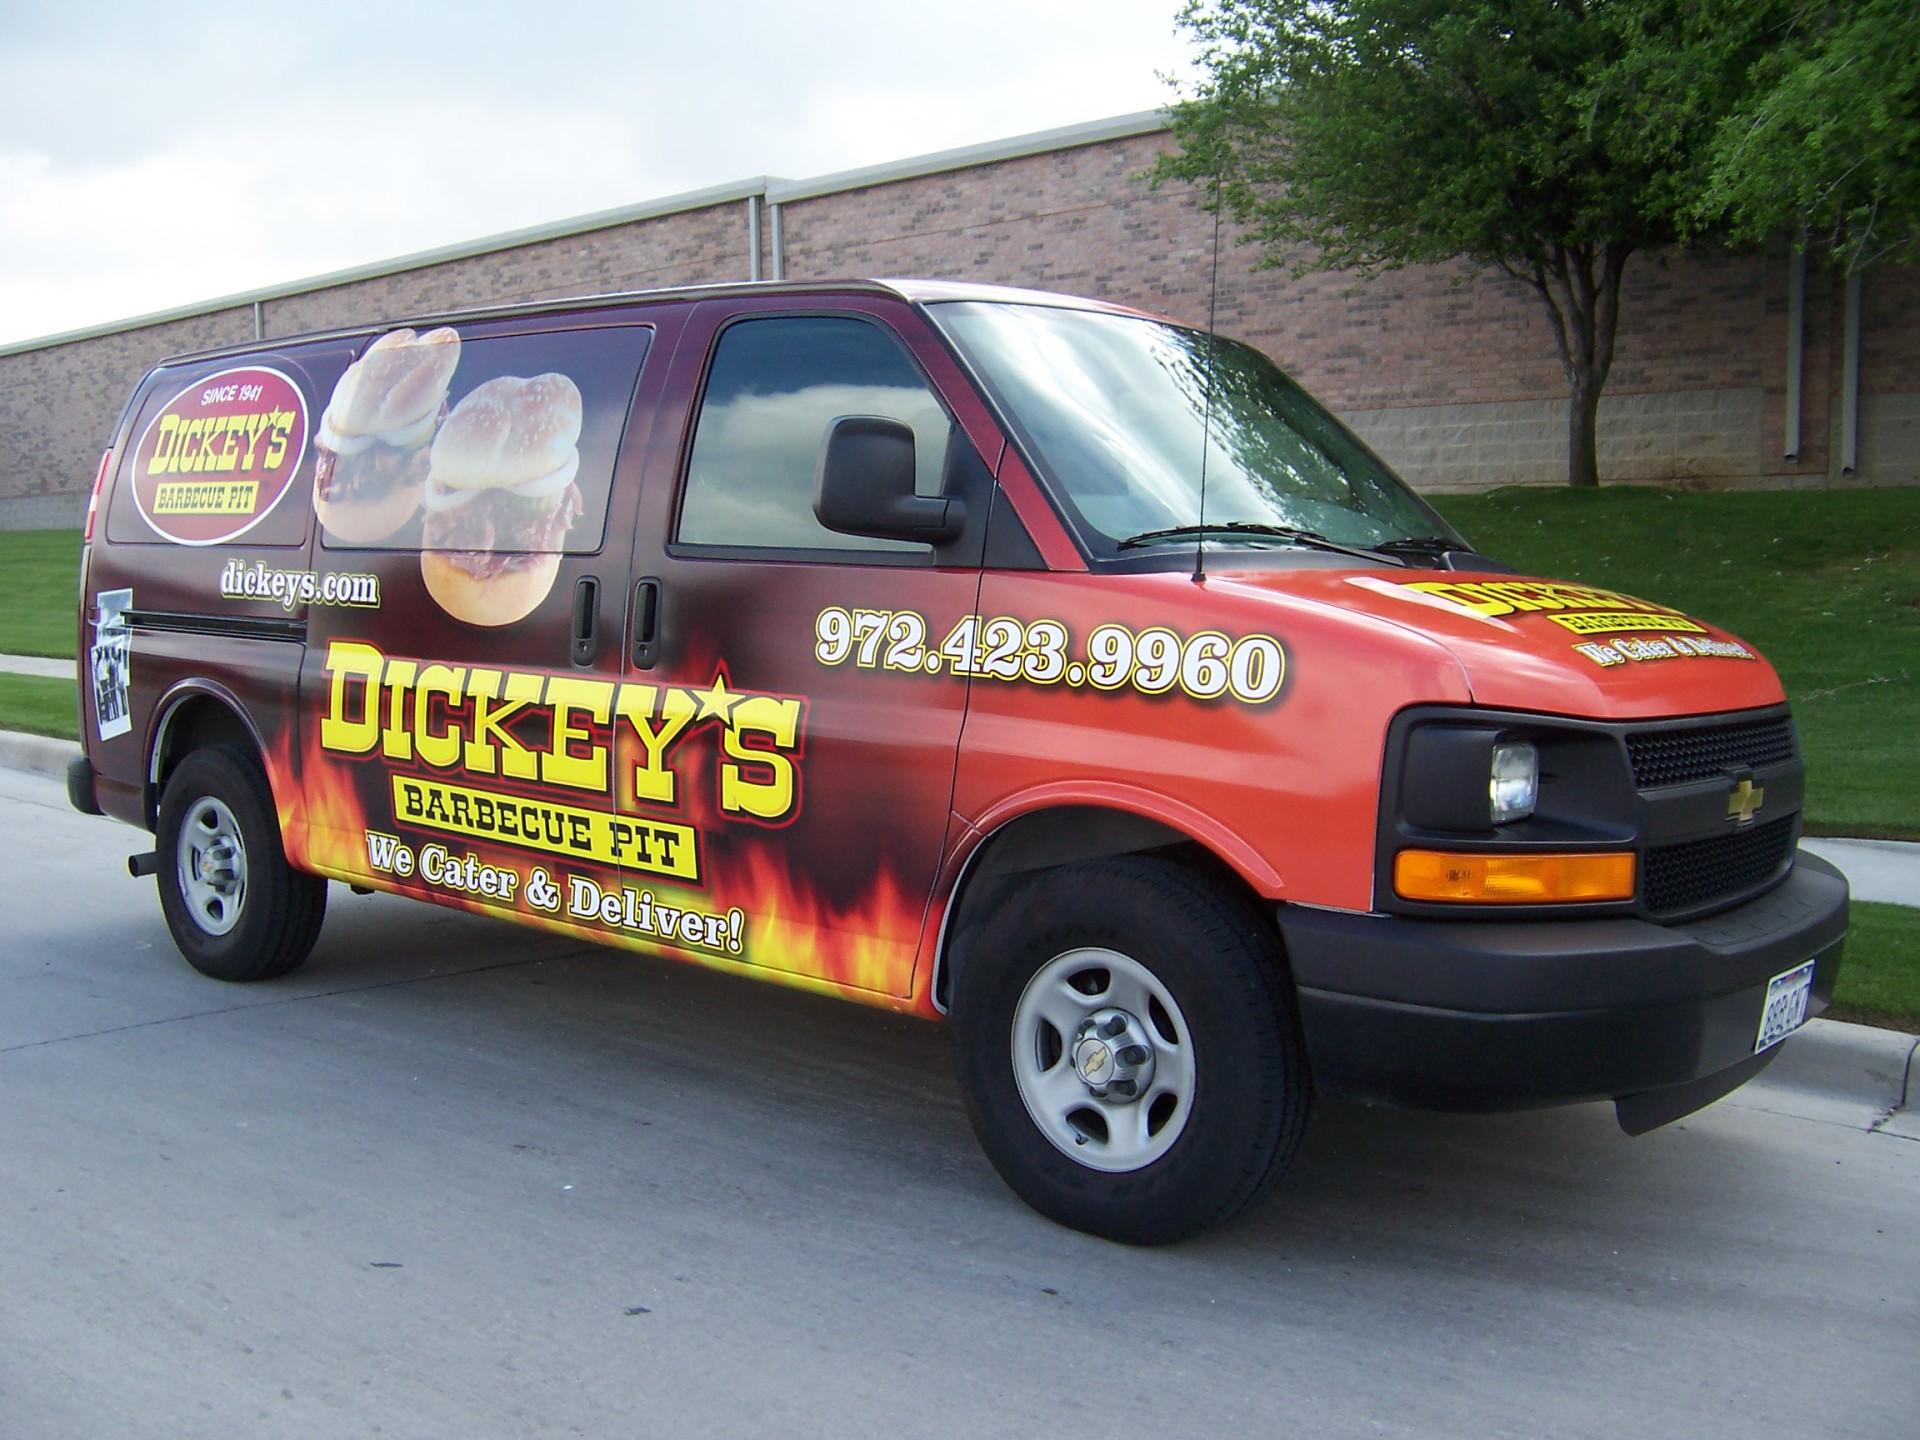 Dickey's Dallas  TX,  Dickey's Vehicle Wraps, Vehicle Wraps Dallas TX